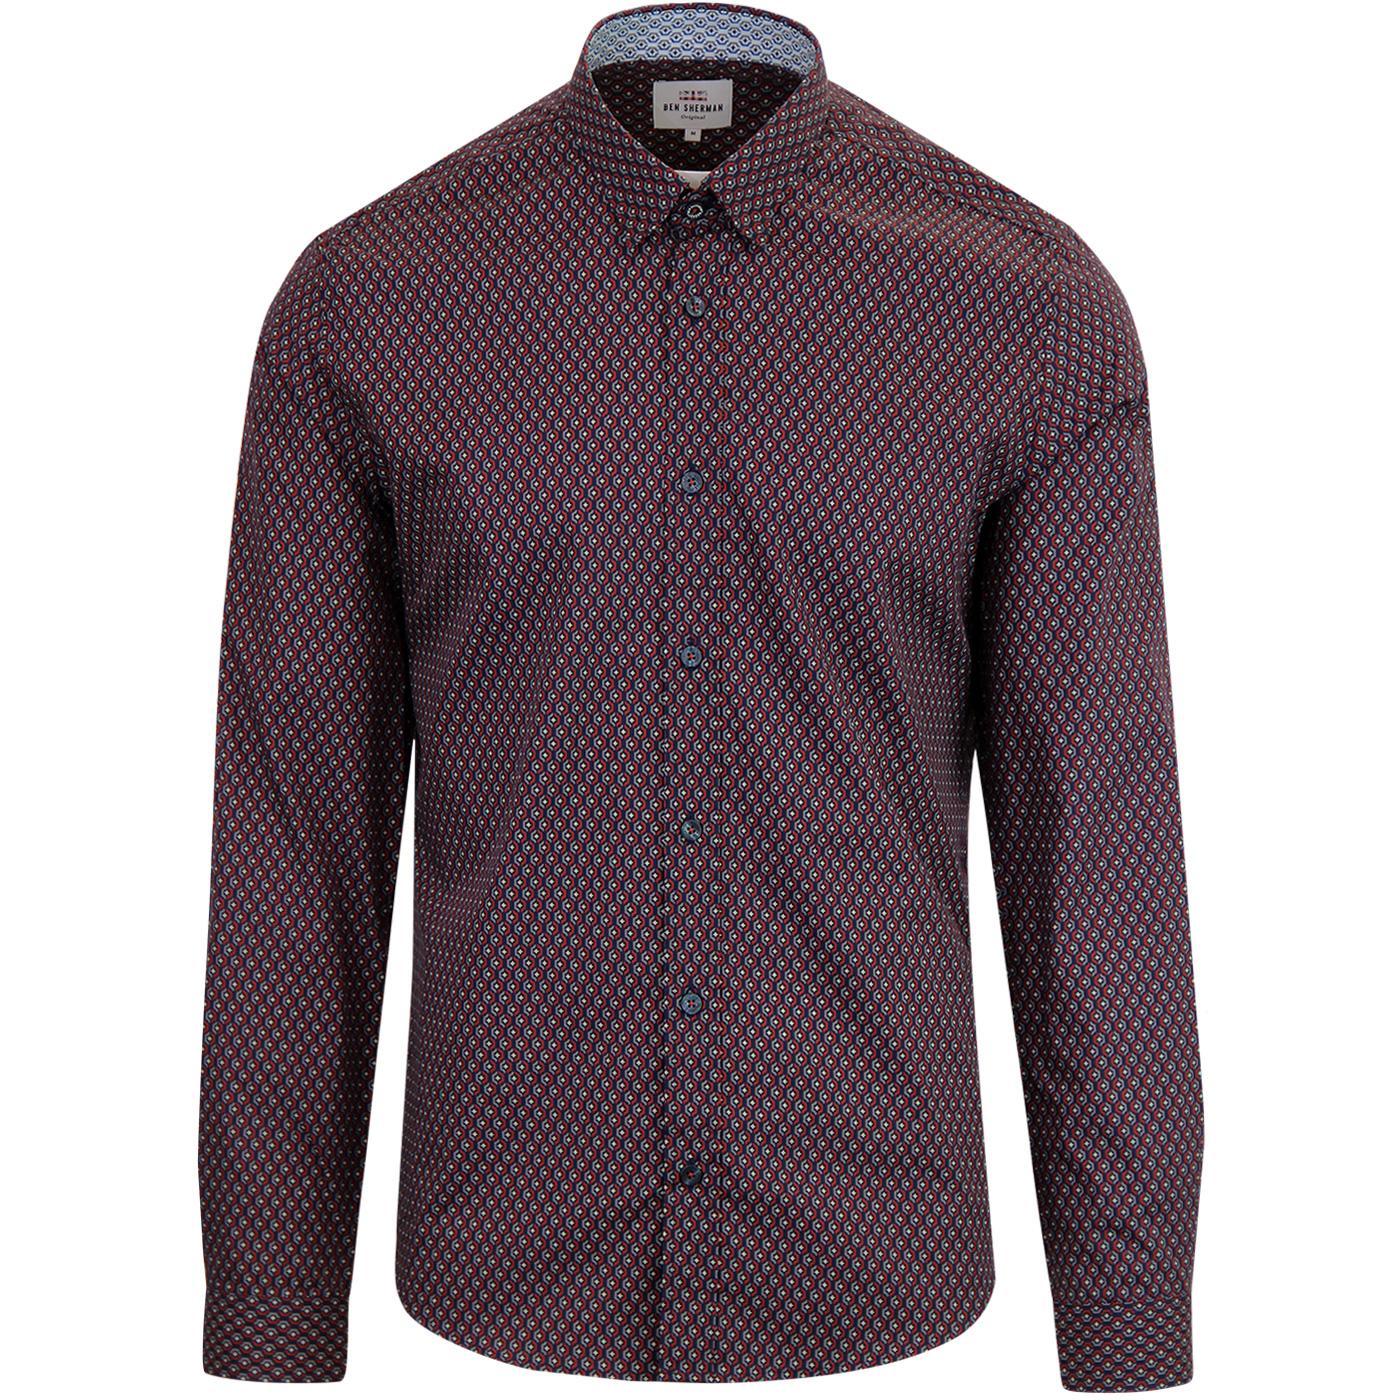 BEN SHERMAN Men's Retro Geo Pop Pattern Shirt